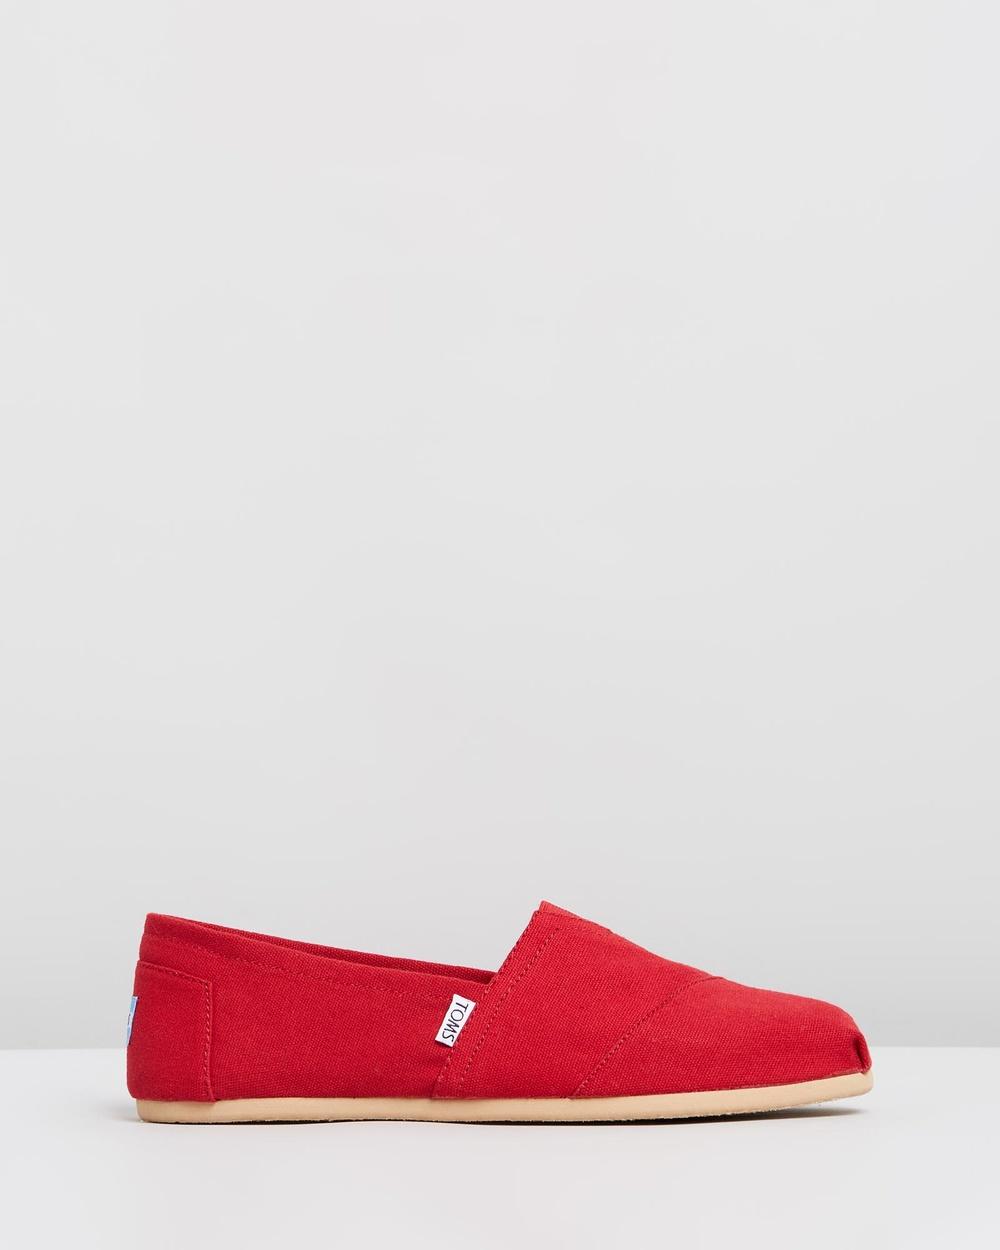 TOMS Canvas Classics Men's Casual Shoes Red Australia